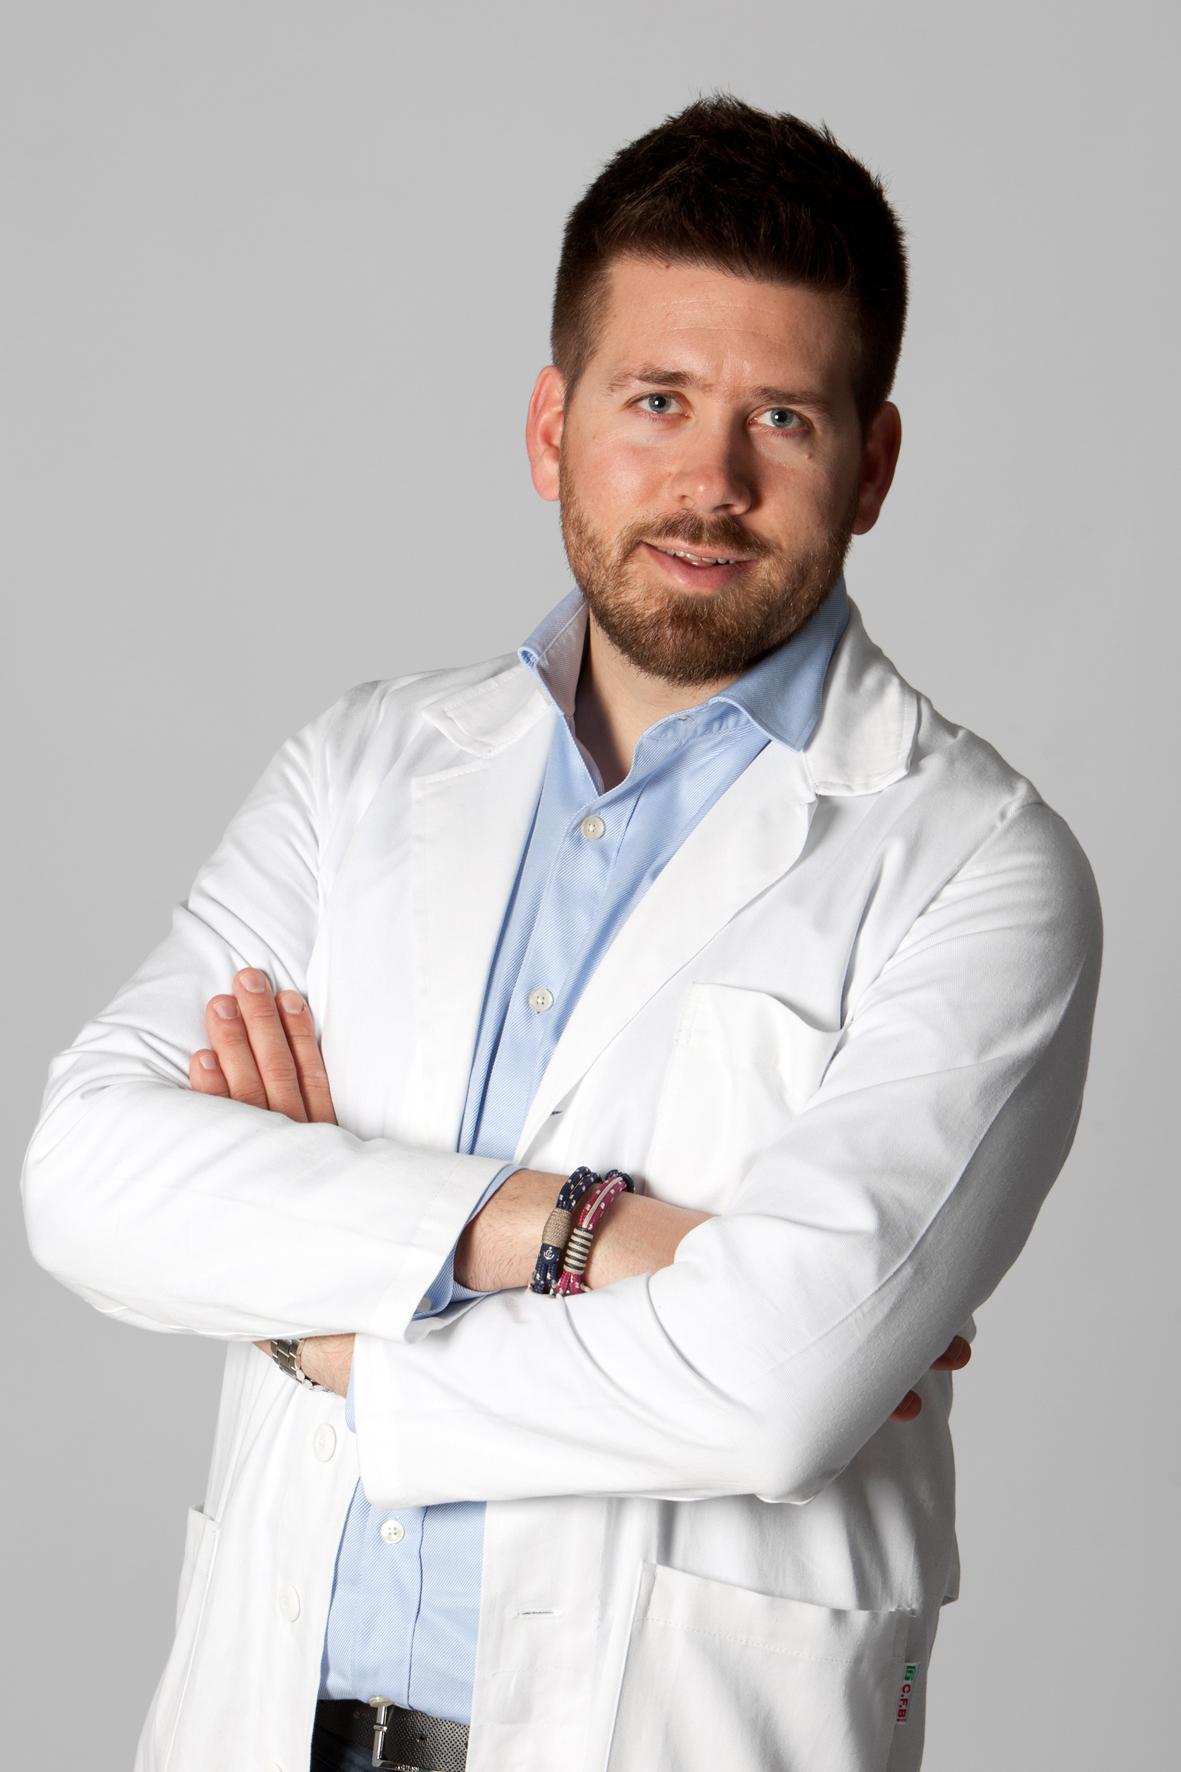 filippo-rivarossa-chirurgo